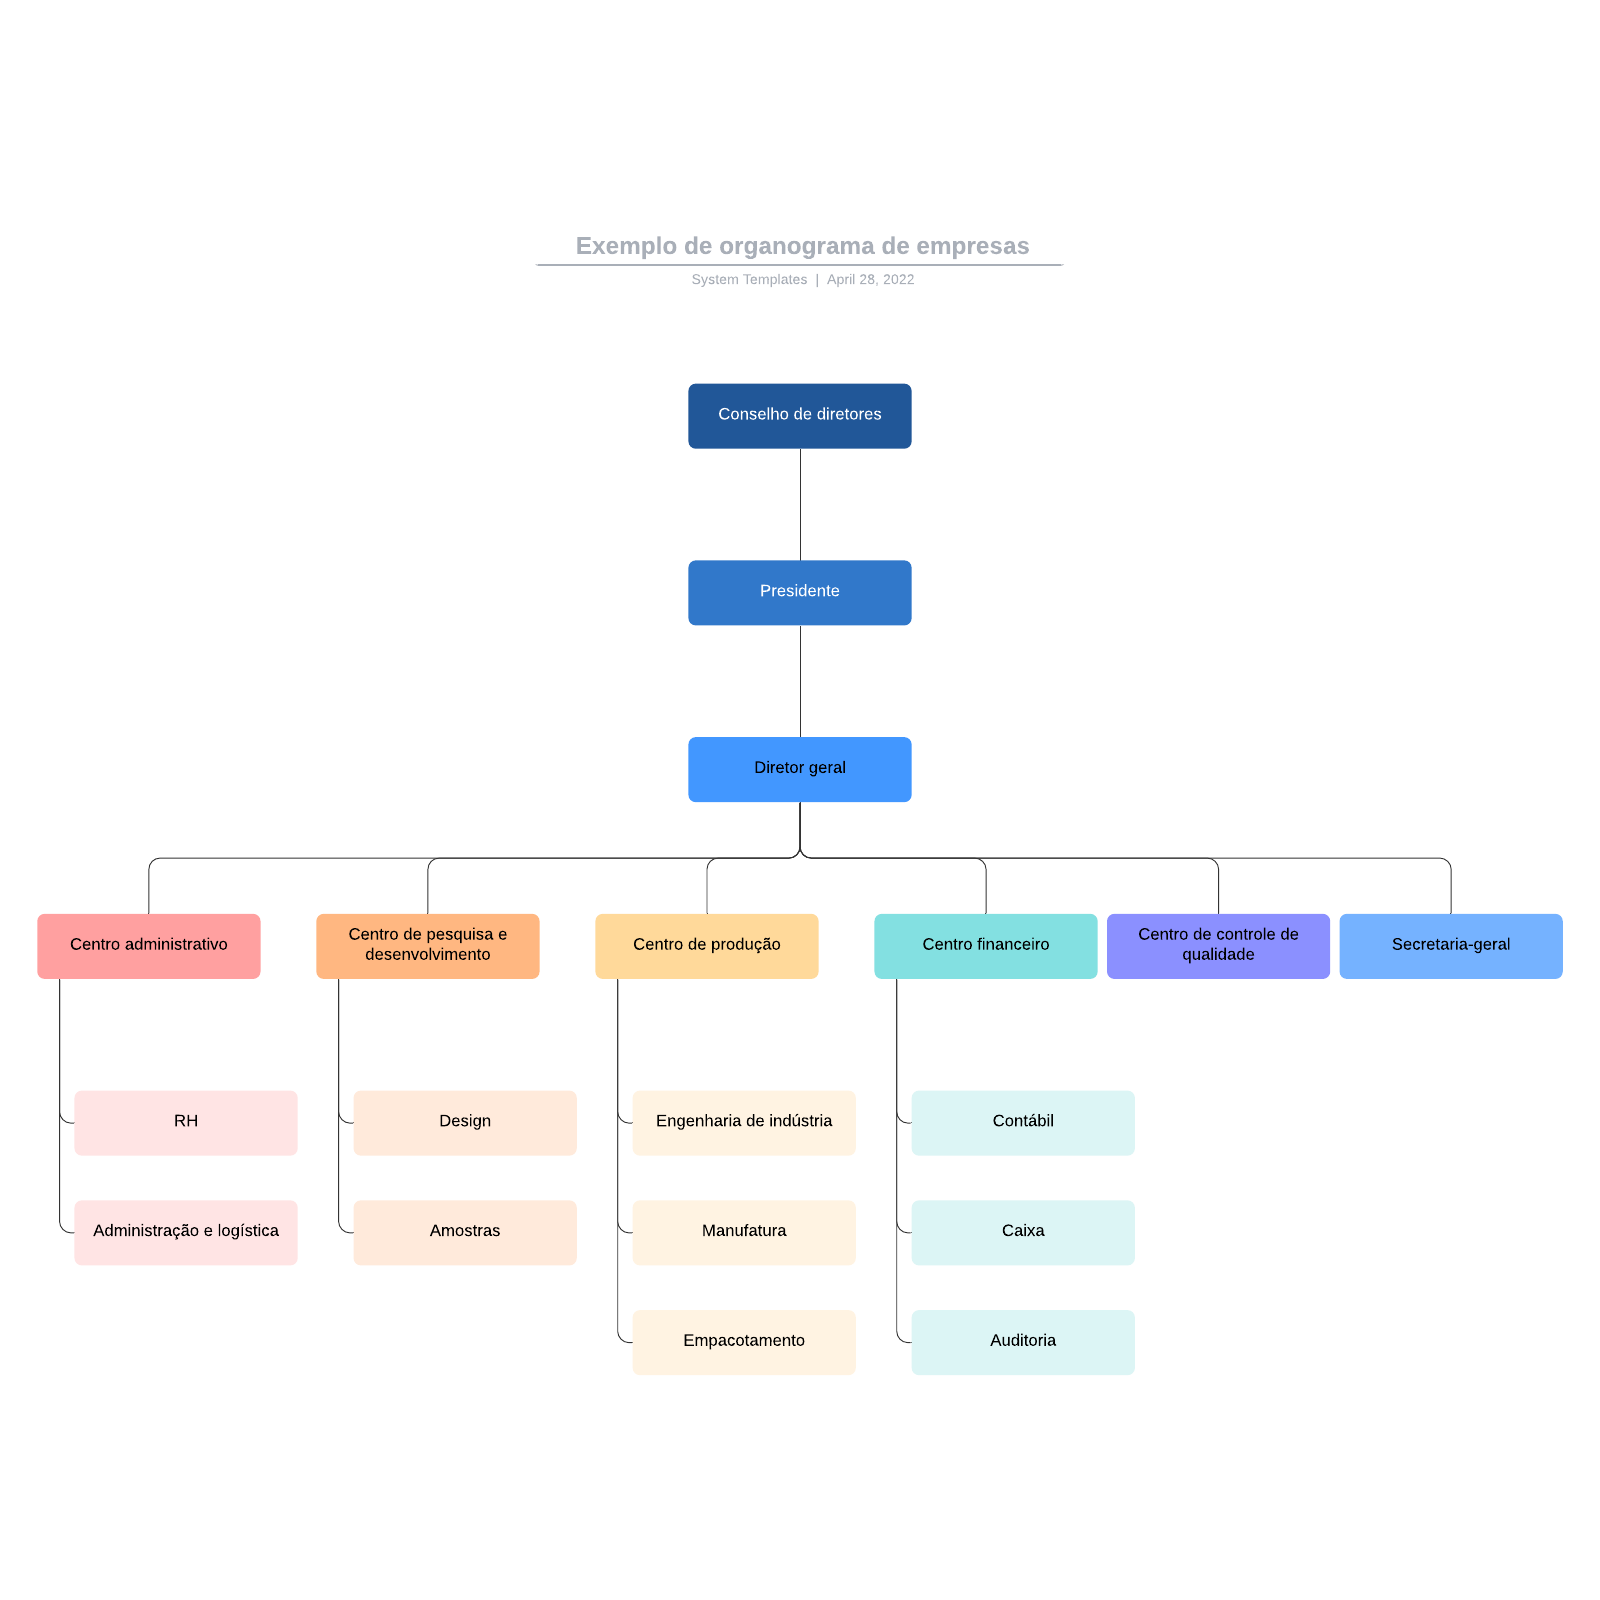 Exemplo de organograma de empresas